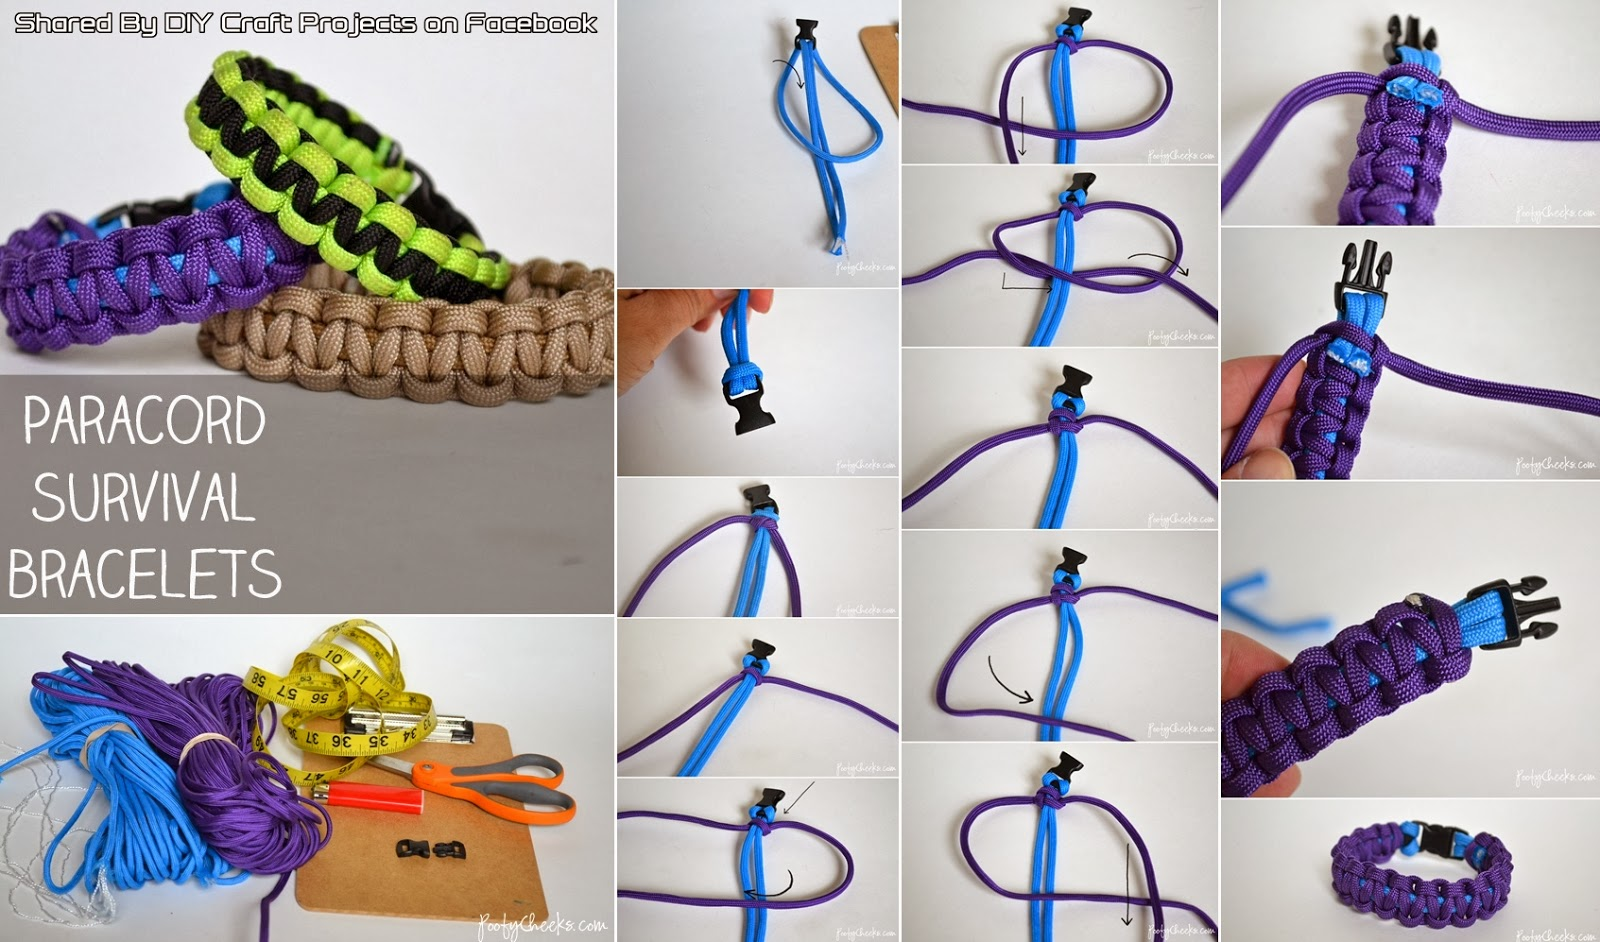 Diy Bracelet Paracord Images Survival Craft Projects Jpg